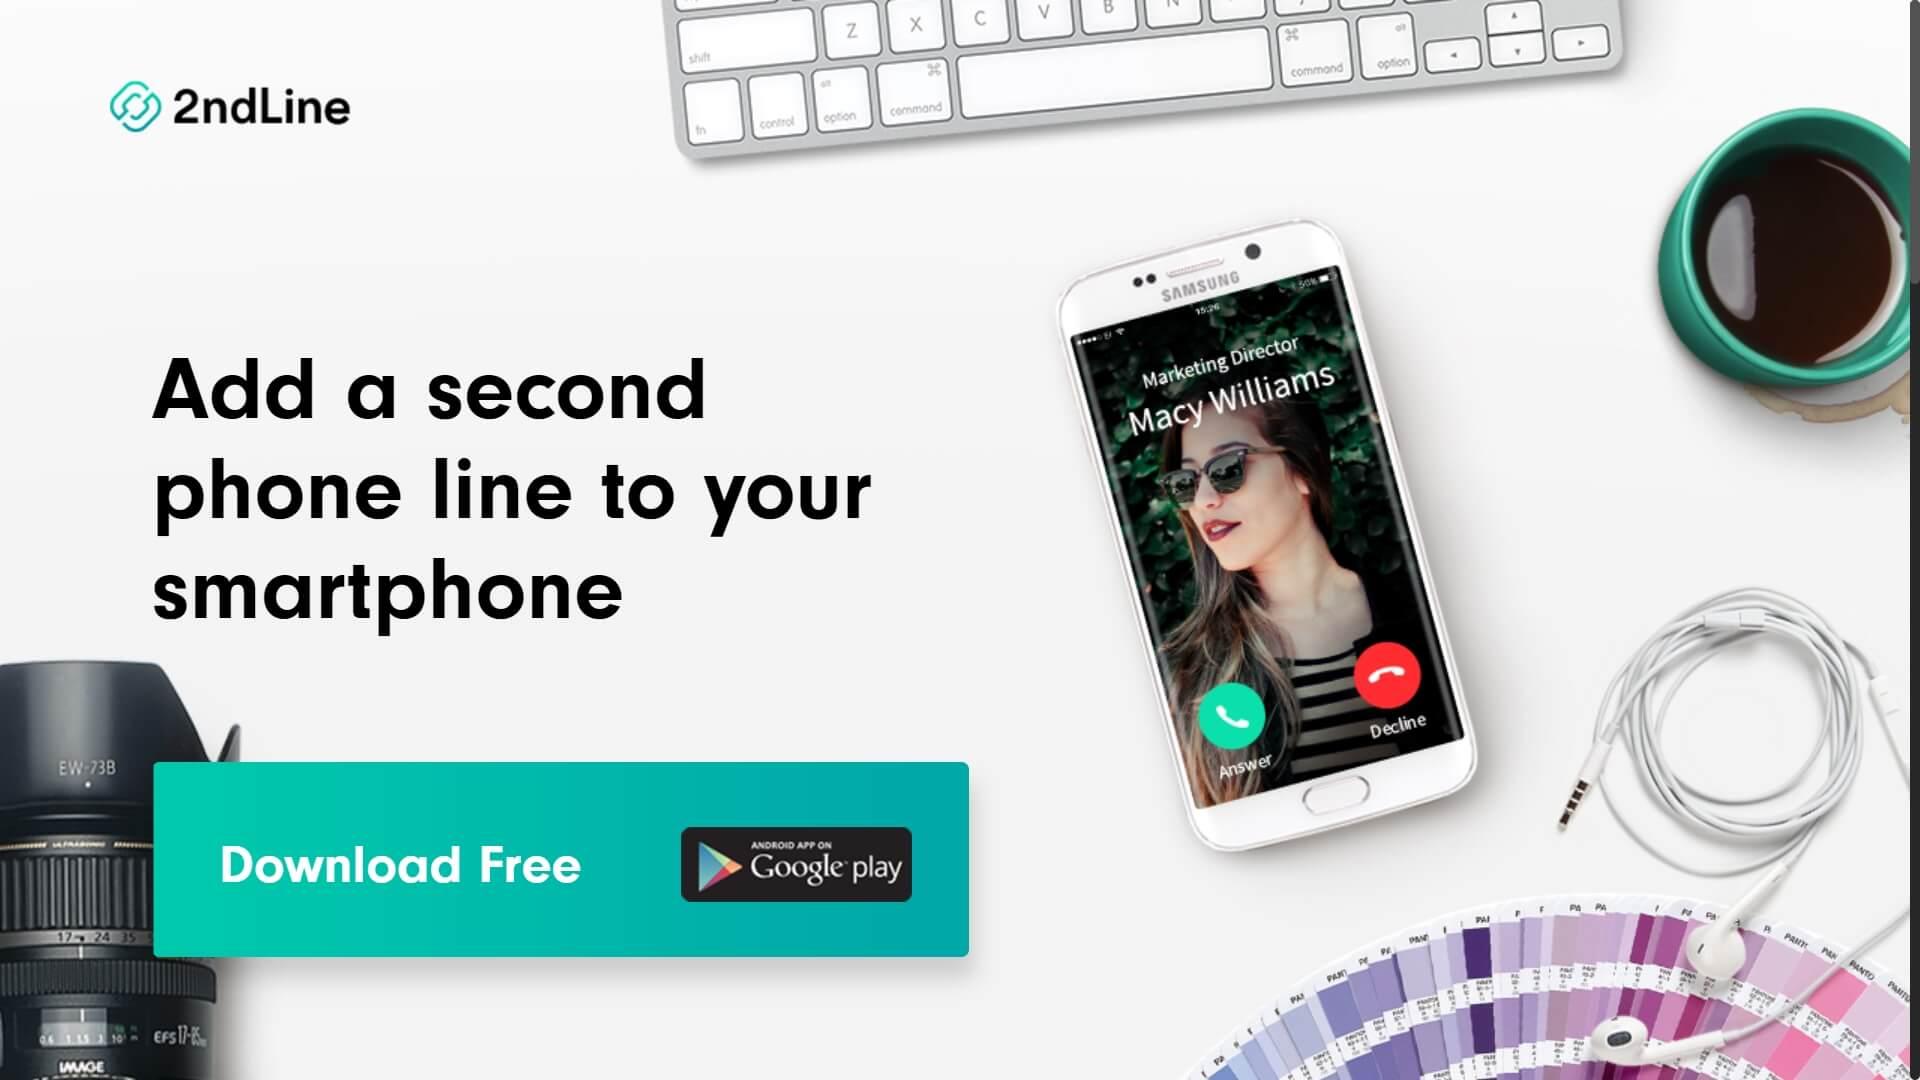 numero virtuel gratuit avec2ndLine Télécharger 2ndLine APK pour avoir un numéro virtuel gratuit USA